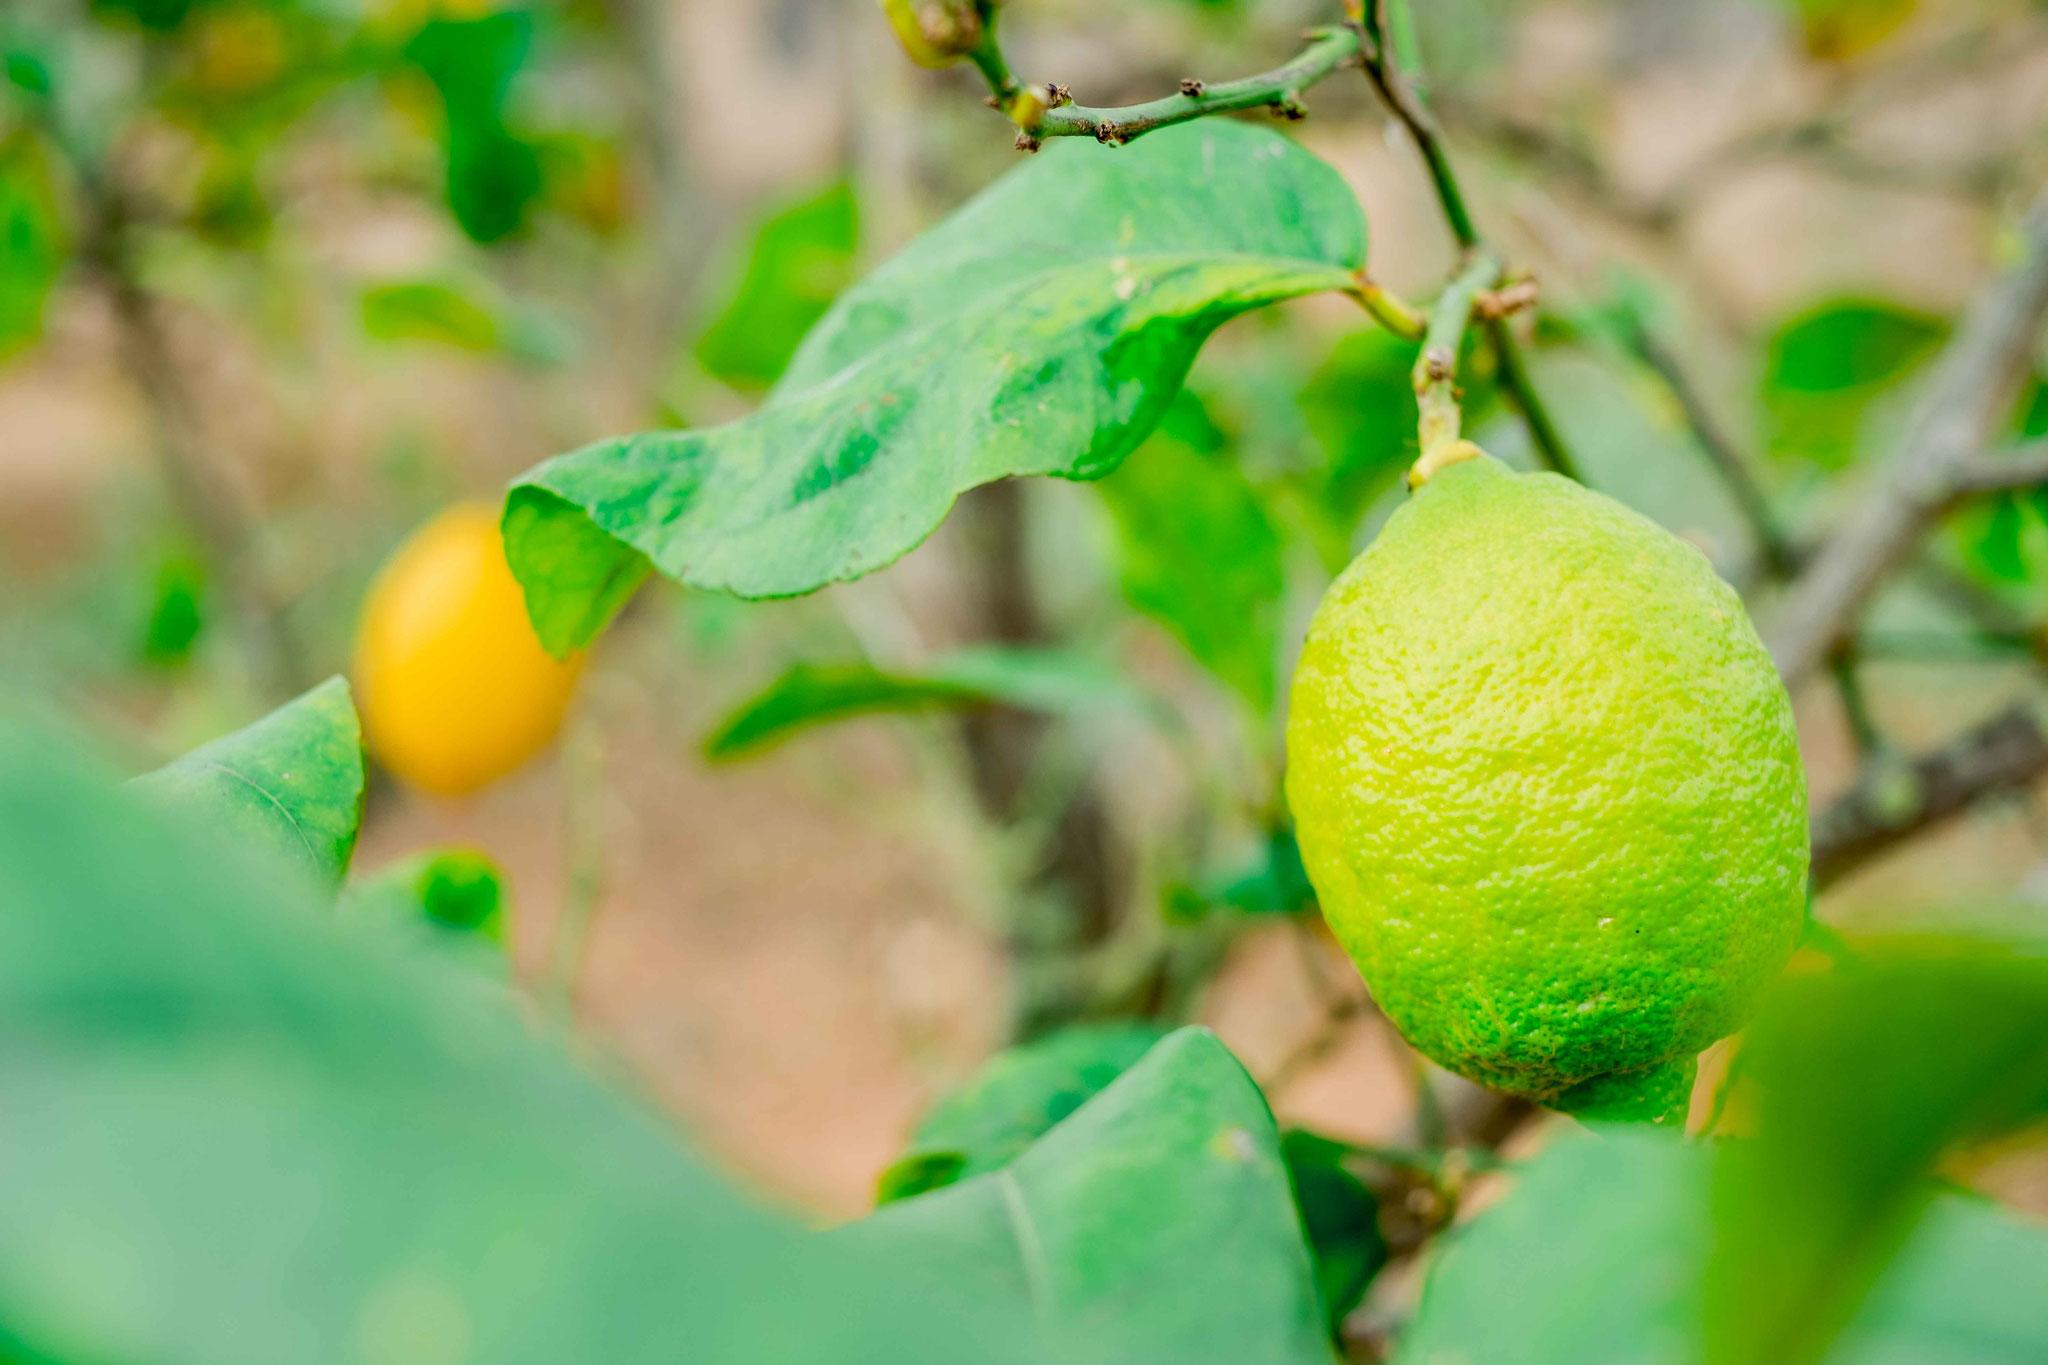 Zitronen aus dem Garten -  Danke Sabine